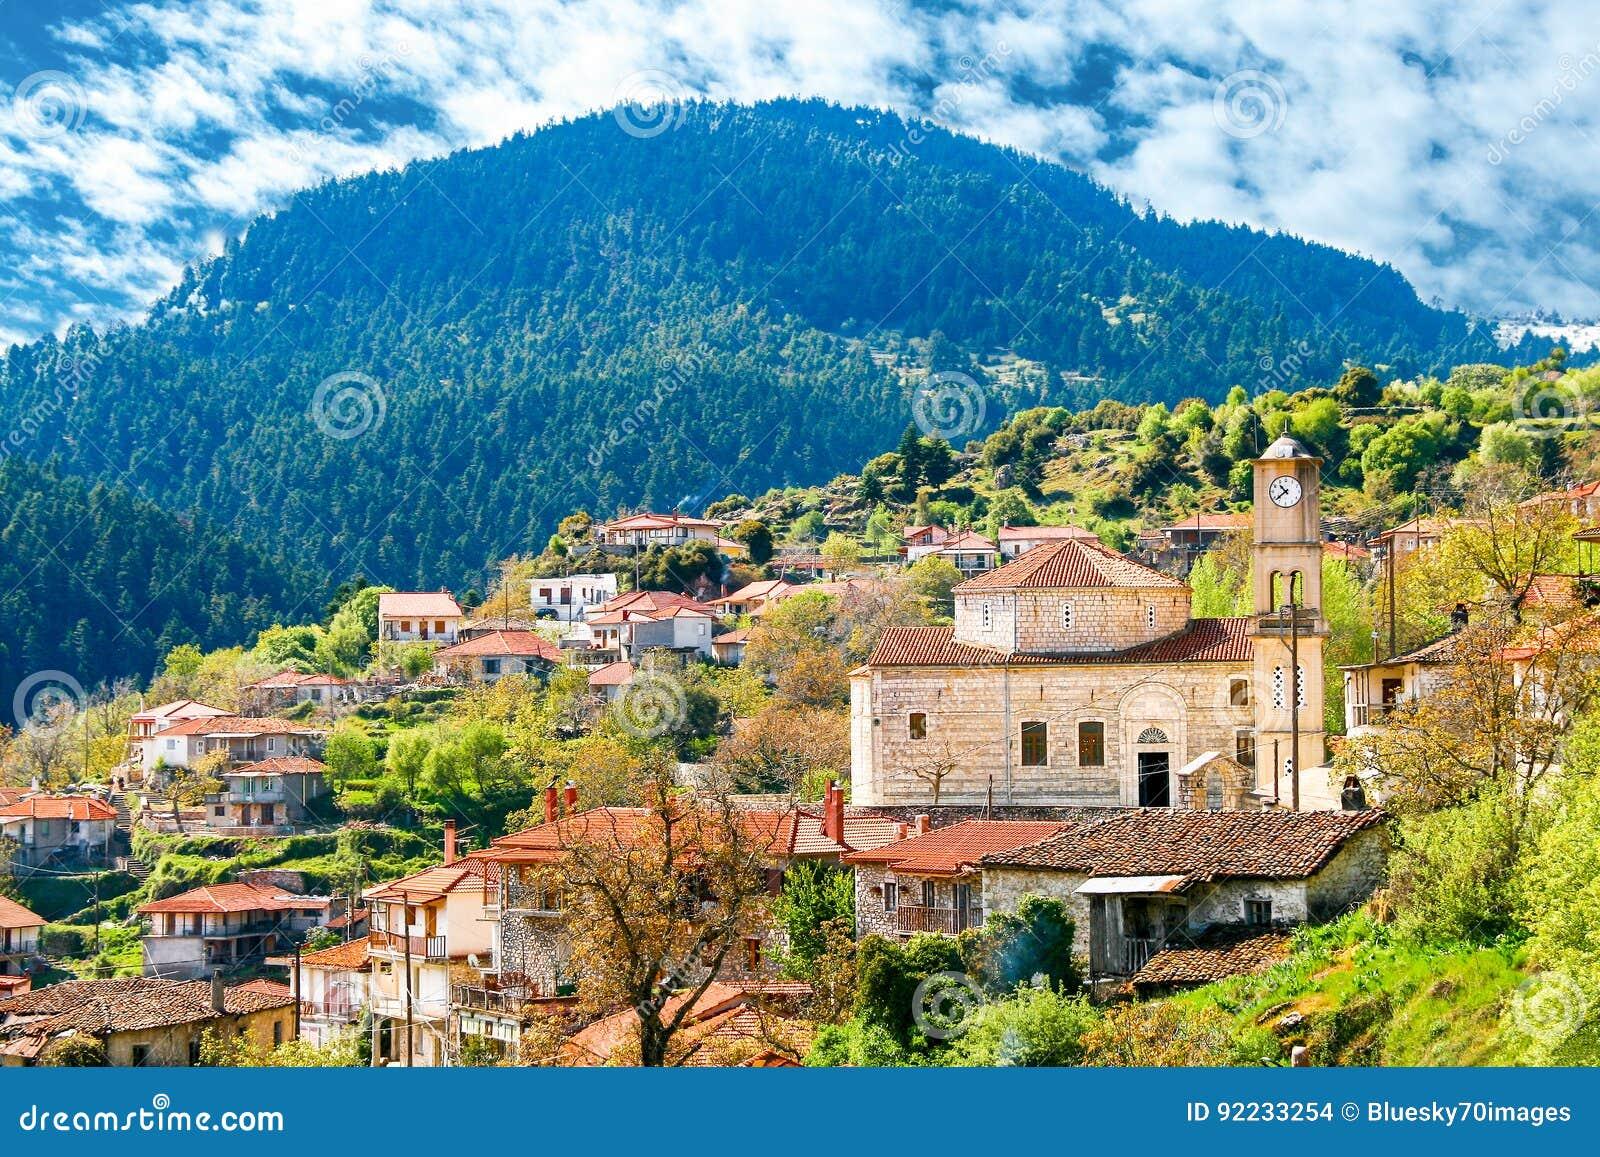 Valtessiniko village in Arcadia, Peloponnese, Greece